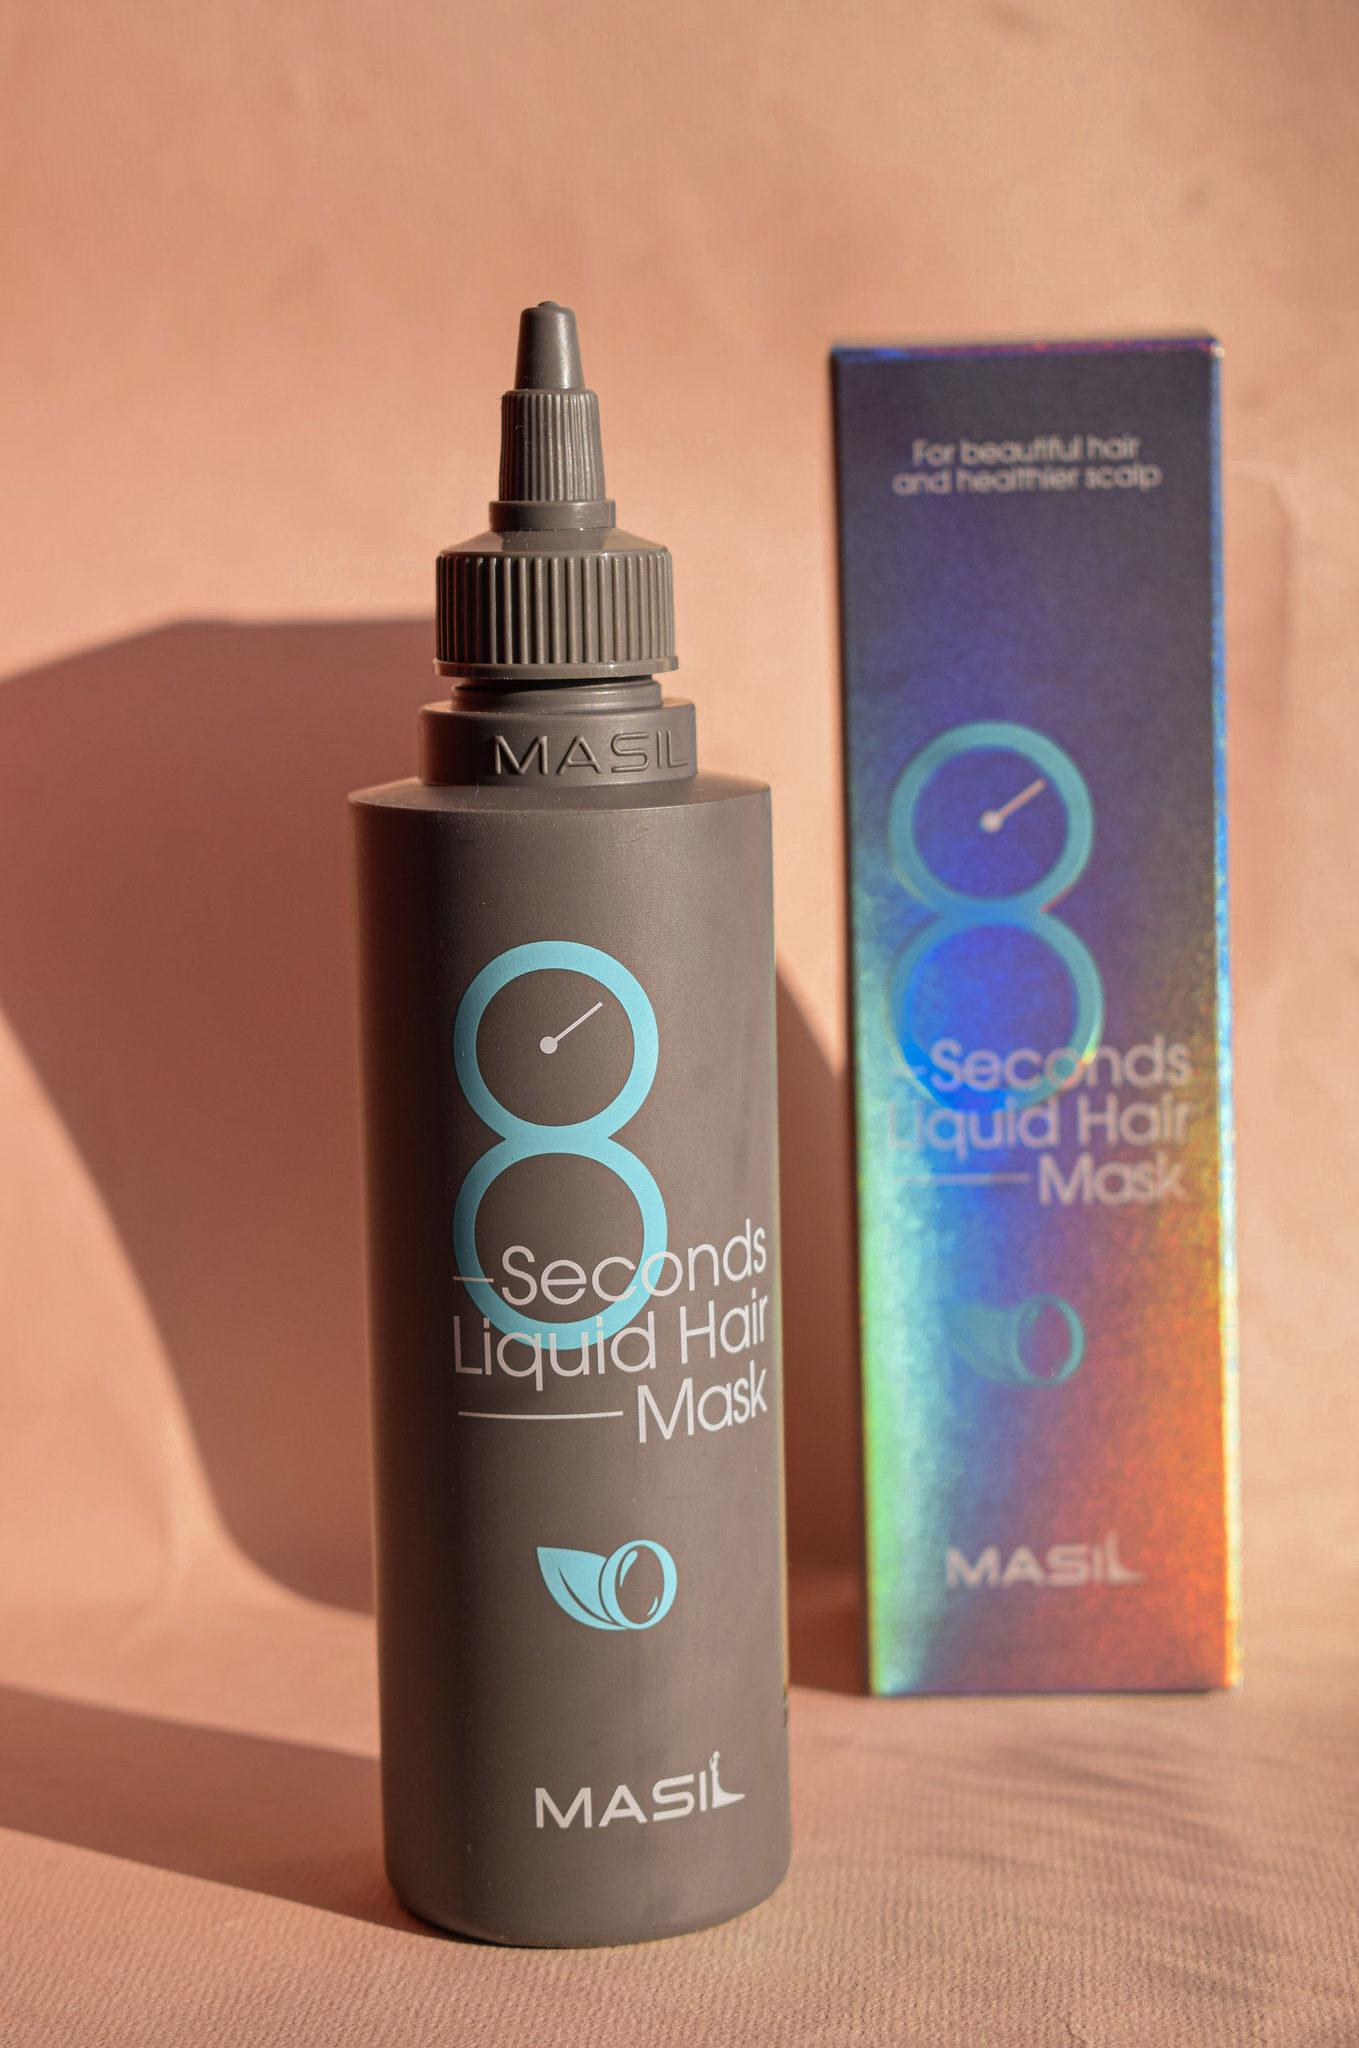 Masil 8 Seconds Salon Liquid Hair Mask